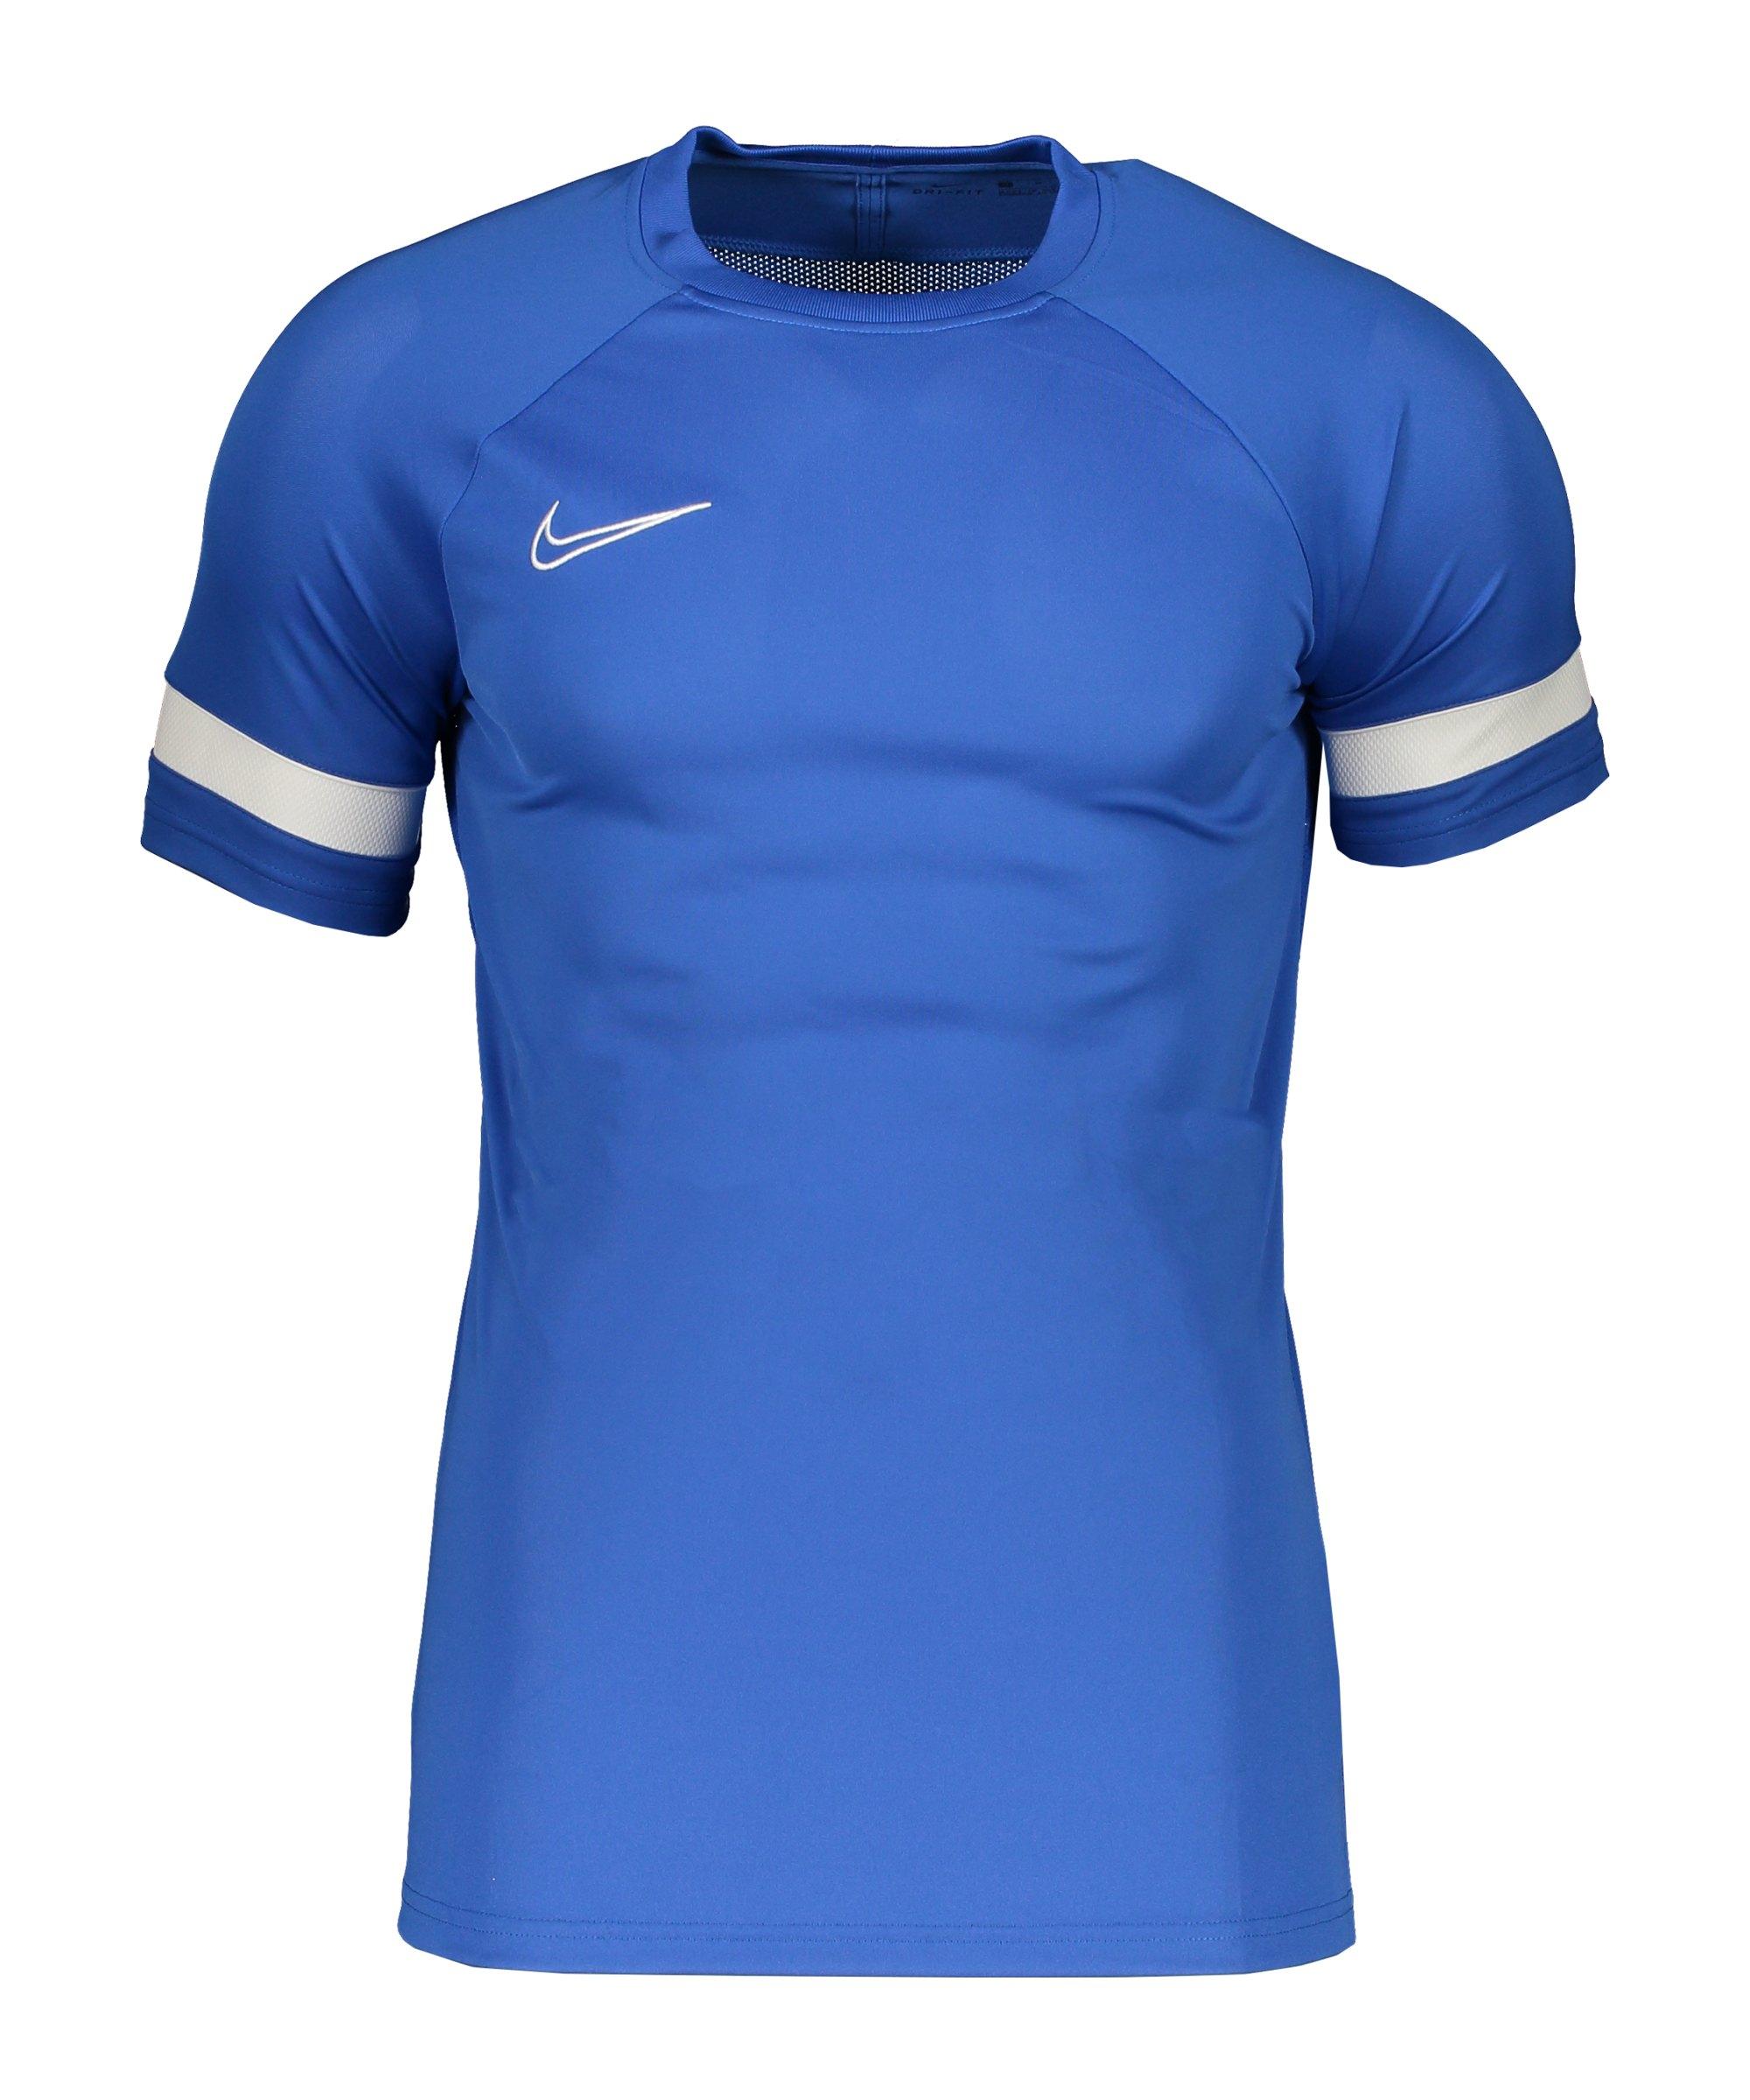 Nike Academy 21 T-Shirt Kids Blau F480 - blau